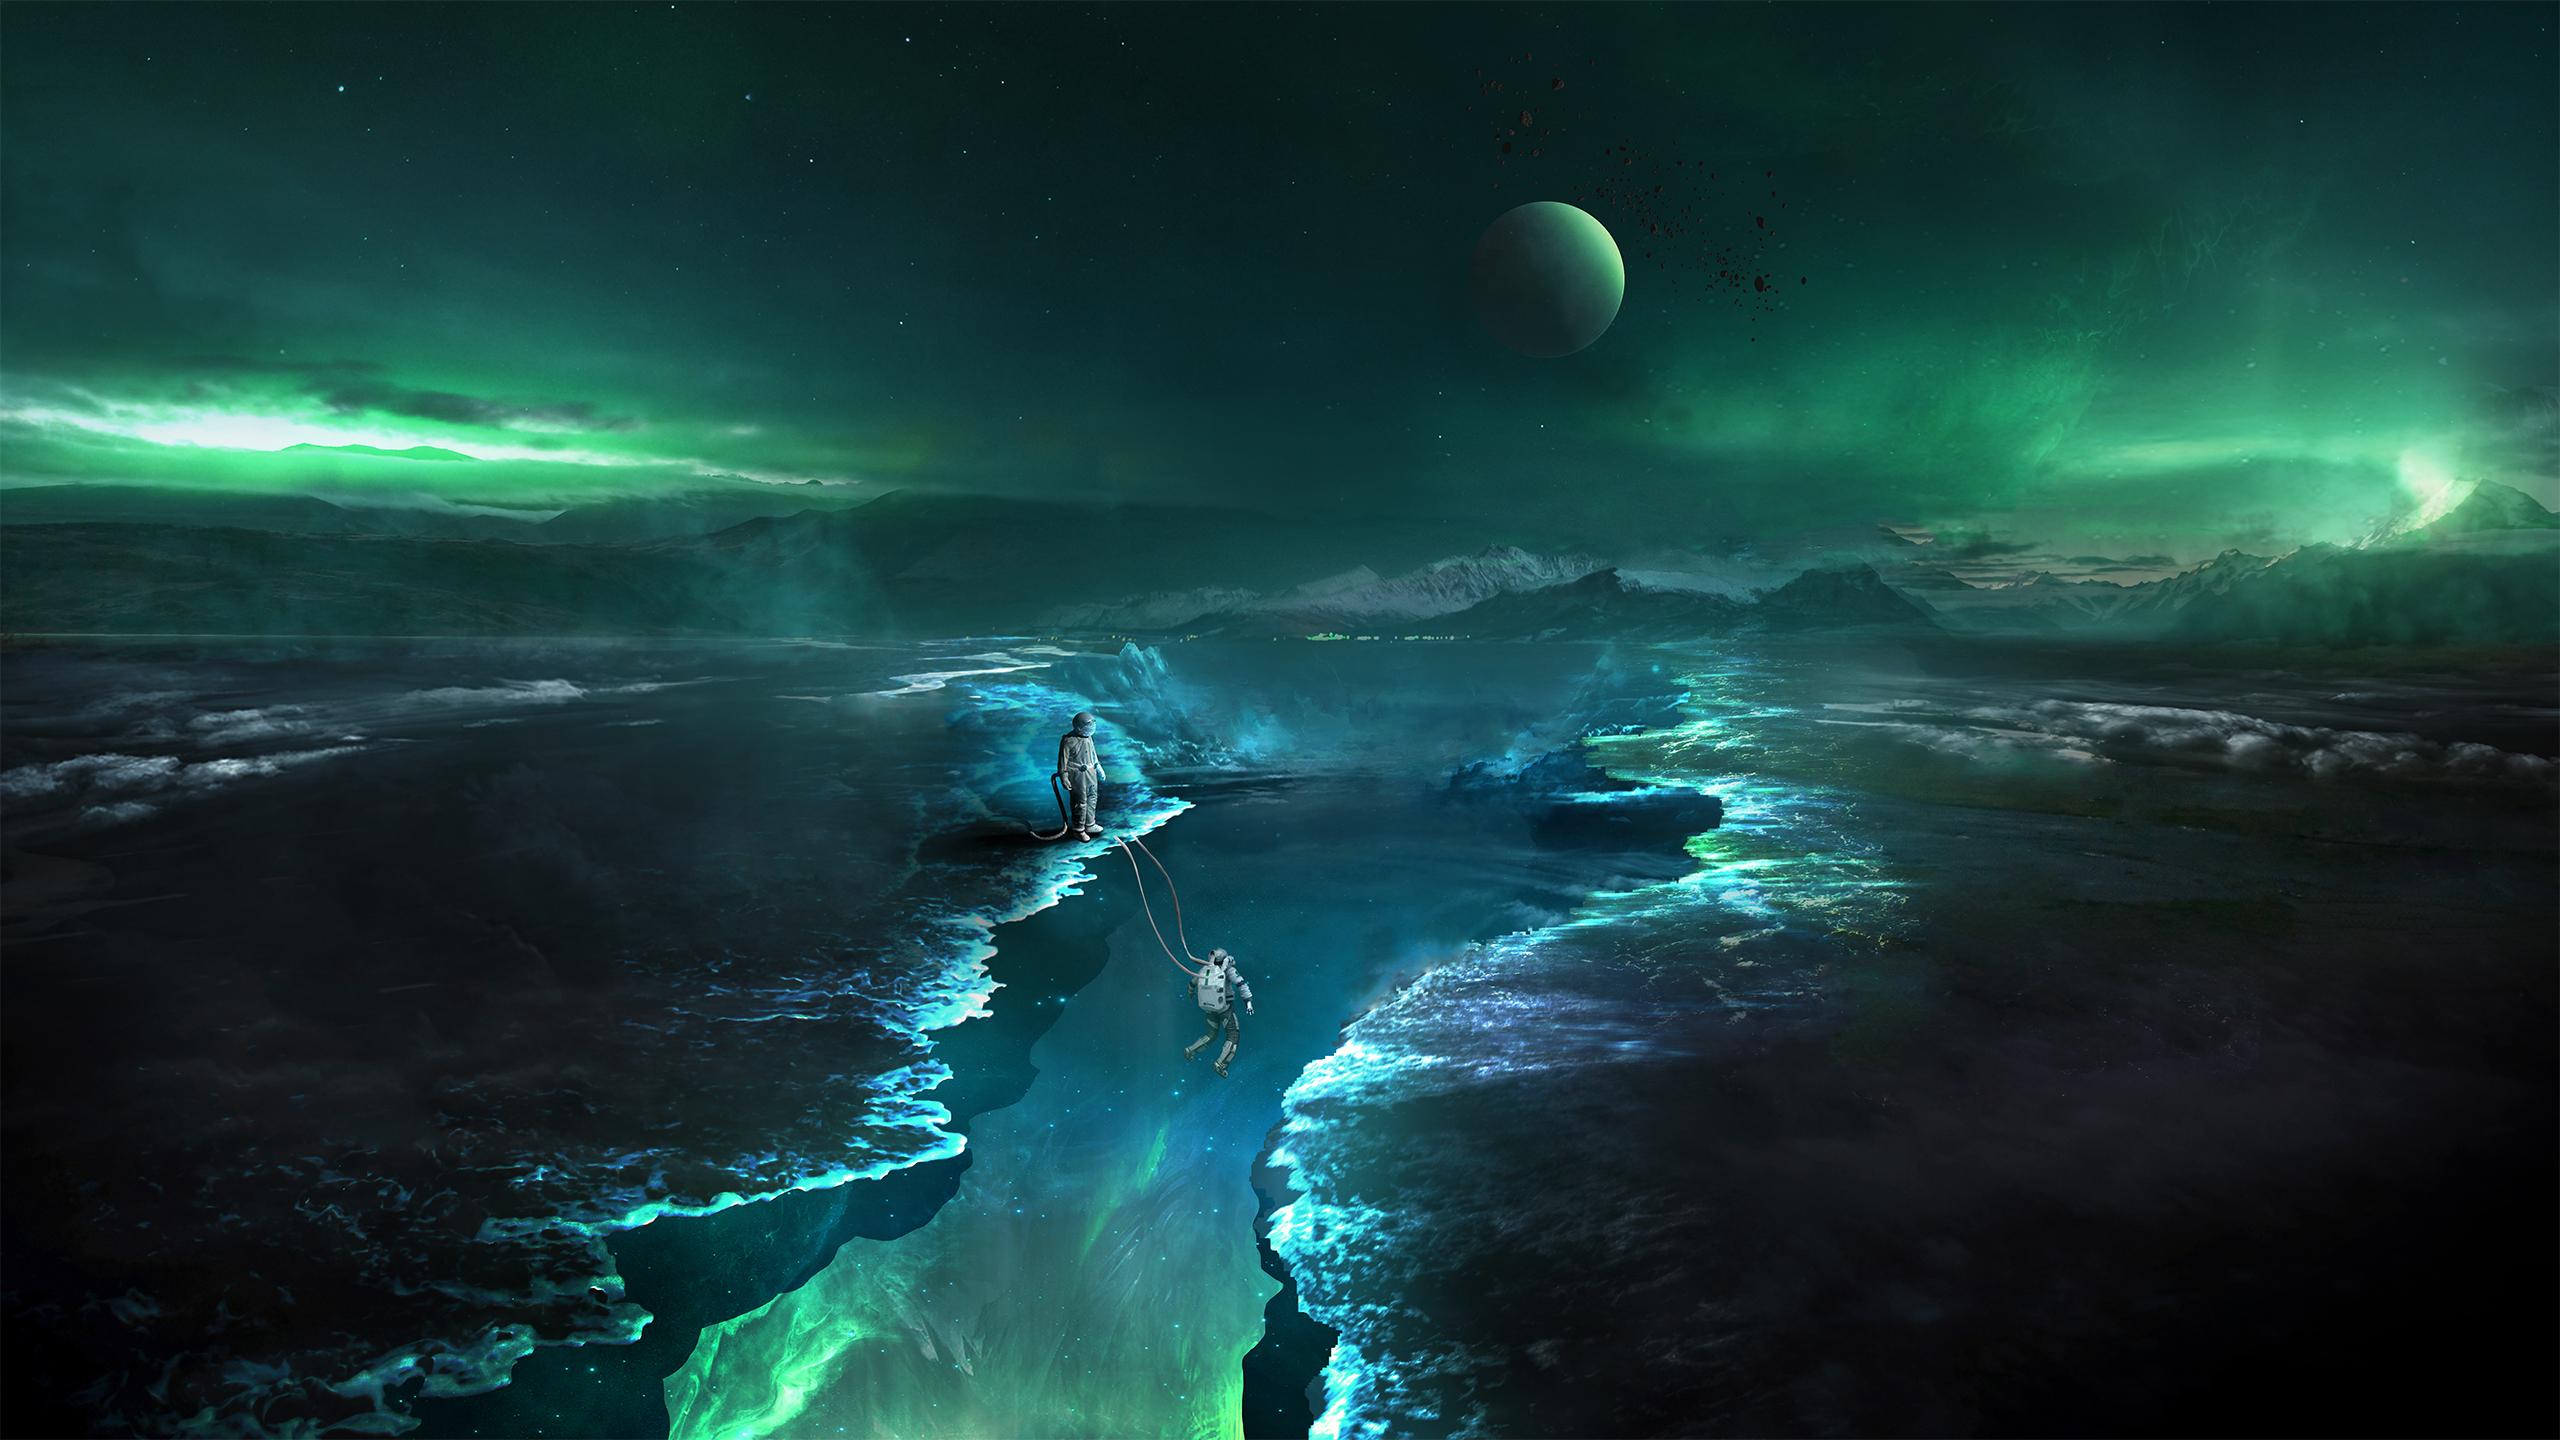 astronaut space digital art fantasy